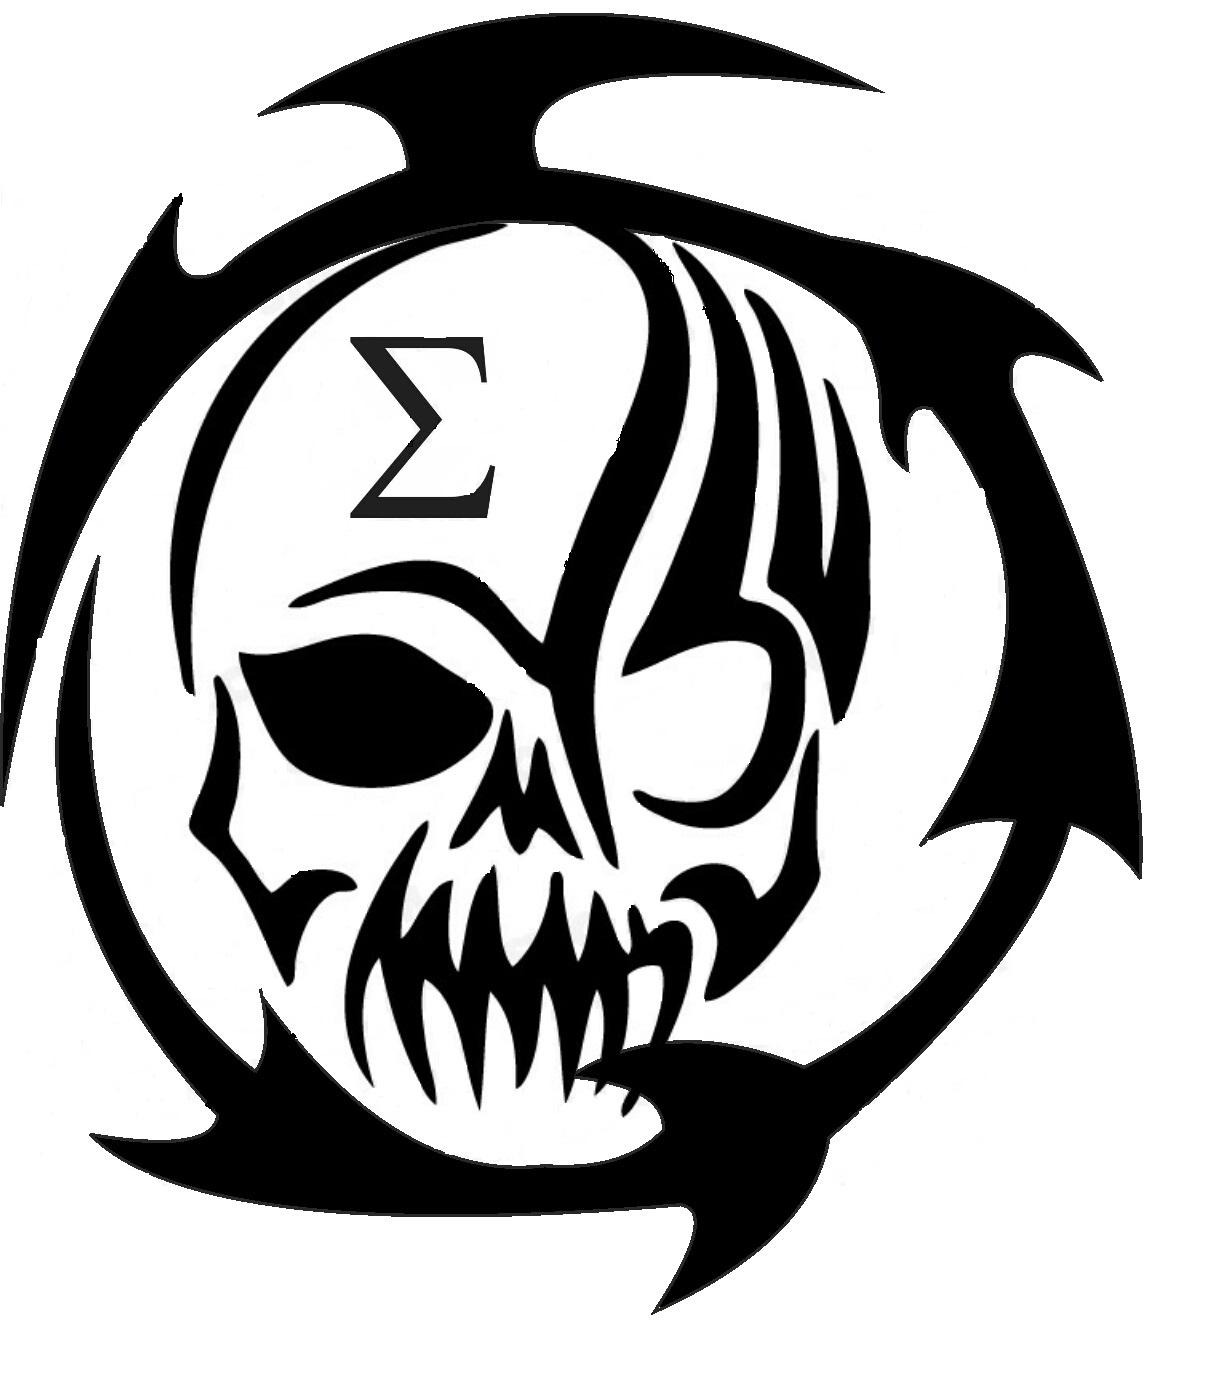 Greek god cronus symbol gallery symbol and sign ideas photo collection hades greek god symbol olive branch with skull symbol of greek god hades stock biocorpaavc